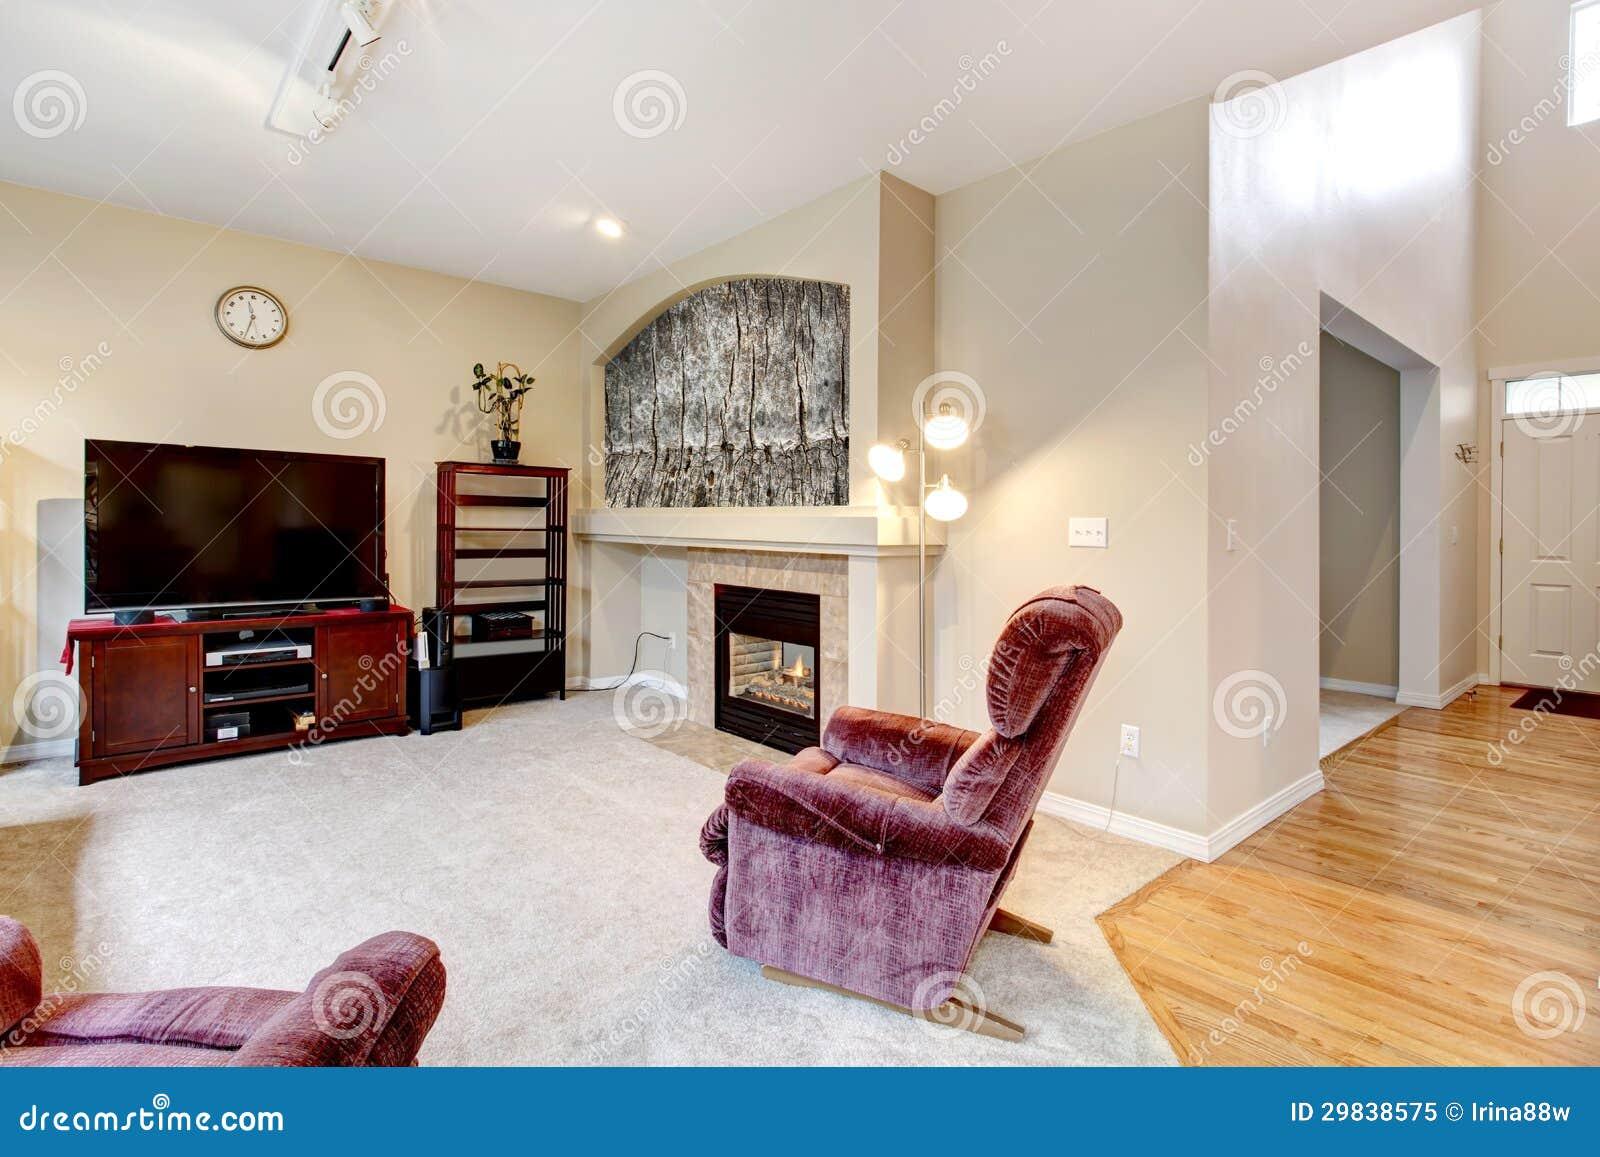 perfect grand intrieur lgant de salon avec la chemine la. Black Bedroom Furniture Sets. Home Design Ideas